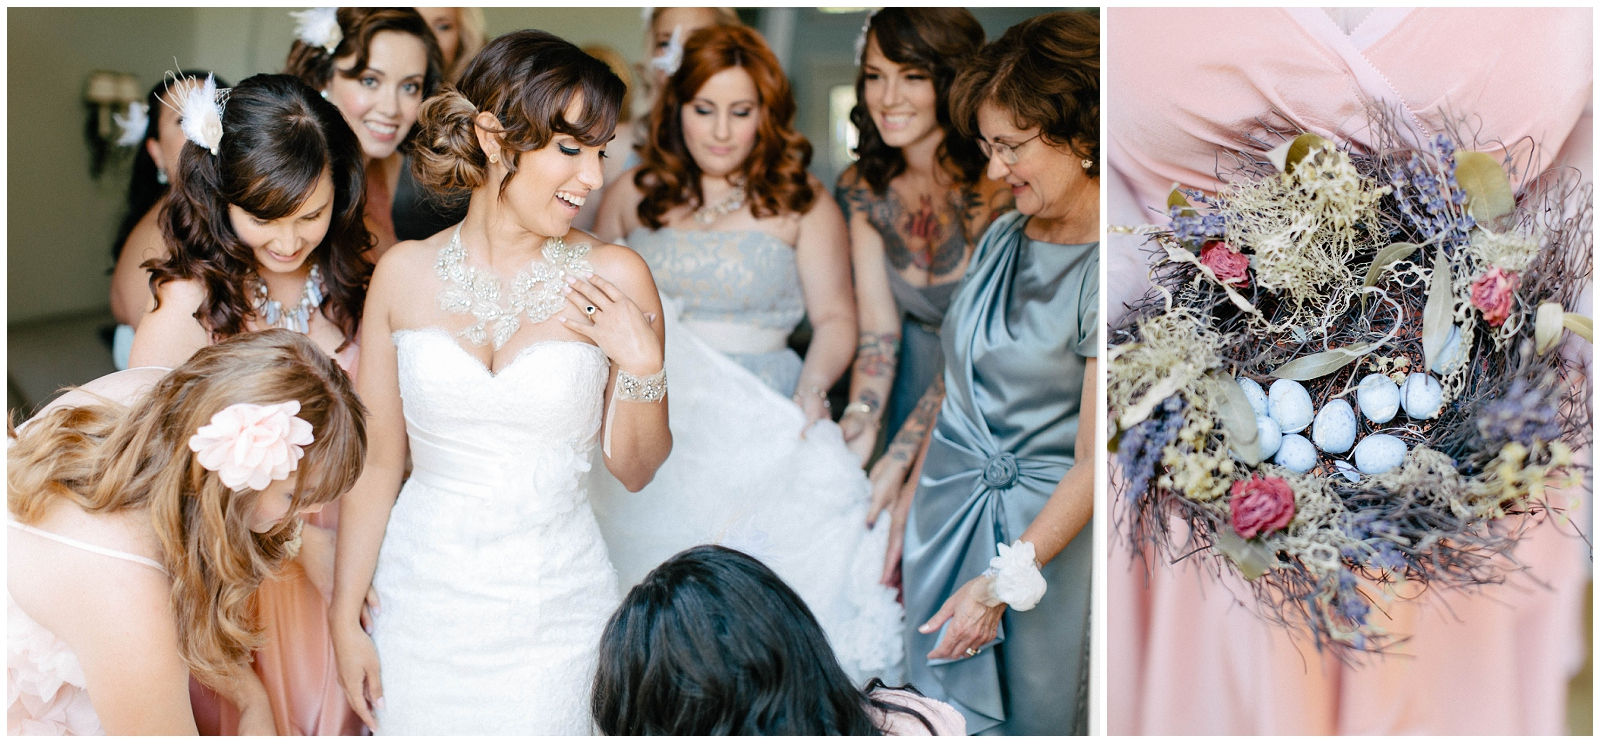 San-Francisco-Bay-Area-Wedding-Photography_Nestle_Down_7.jpg